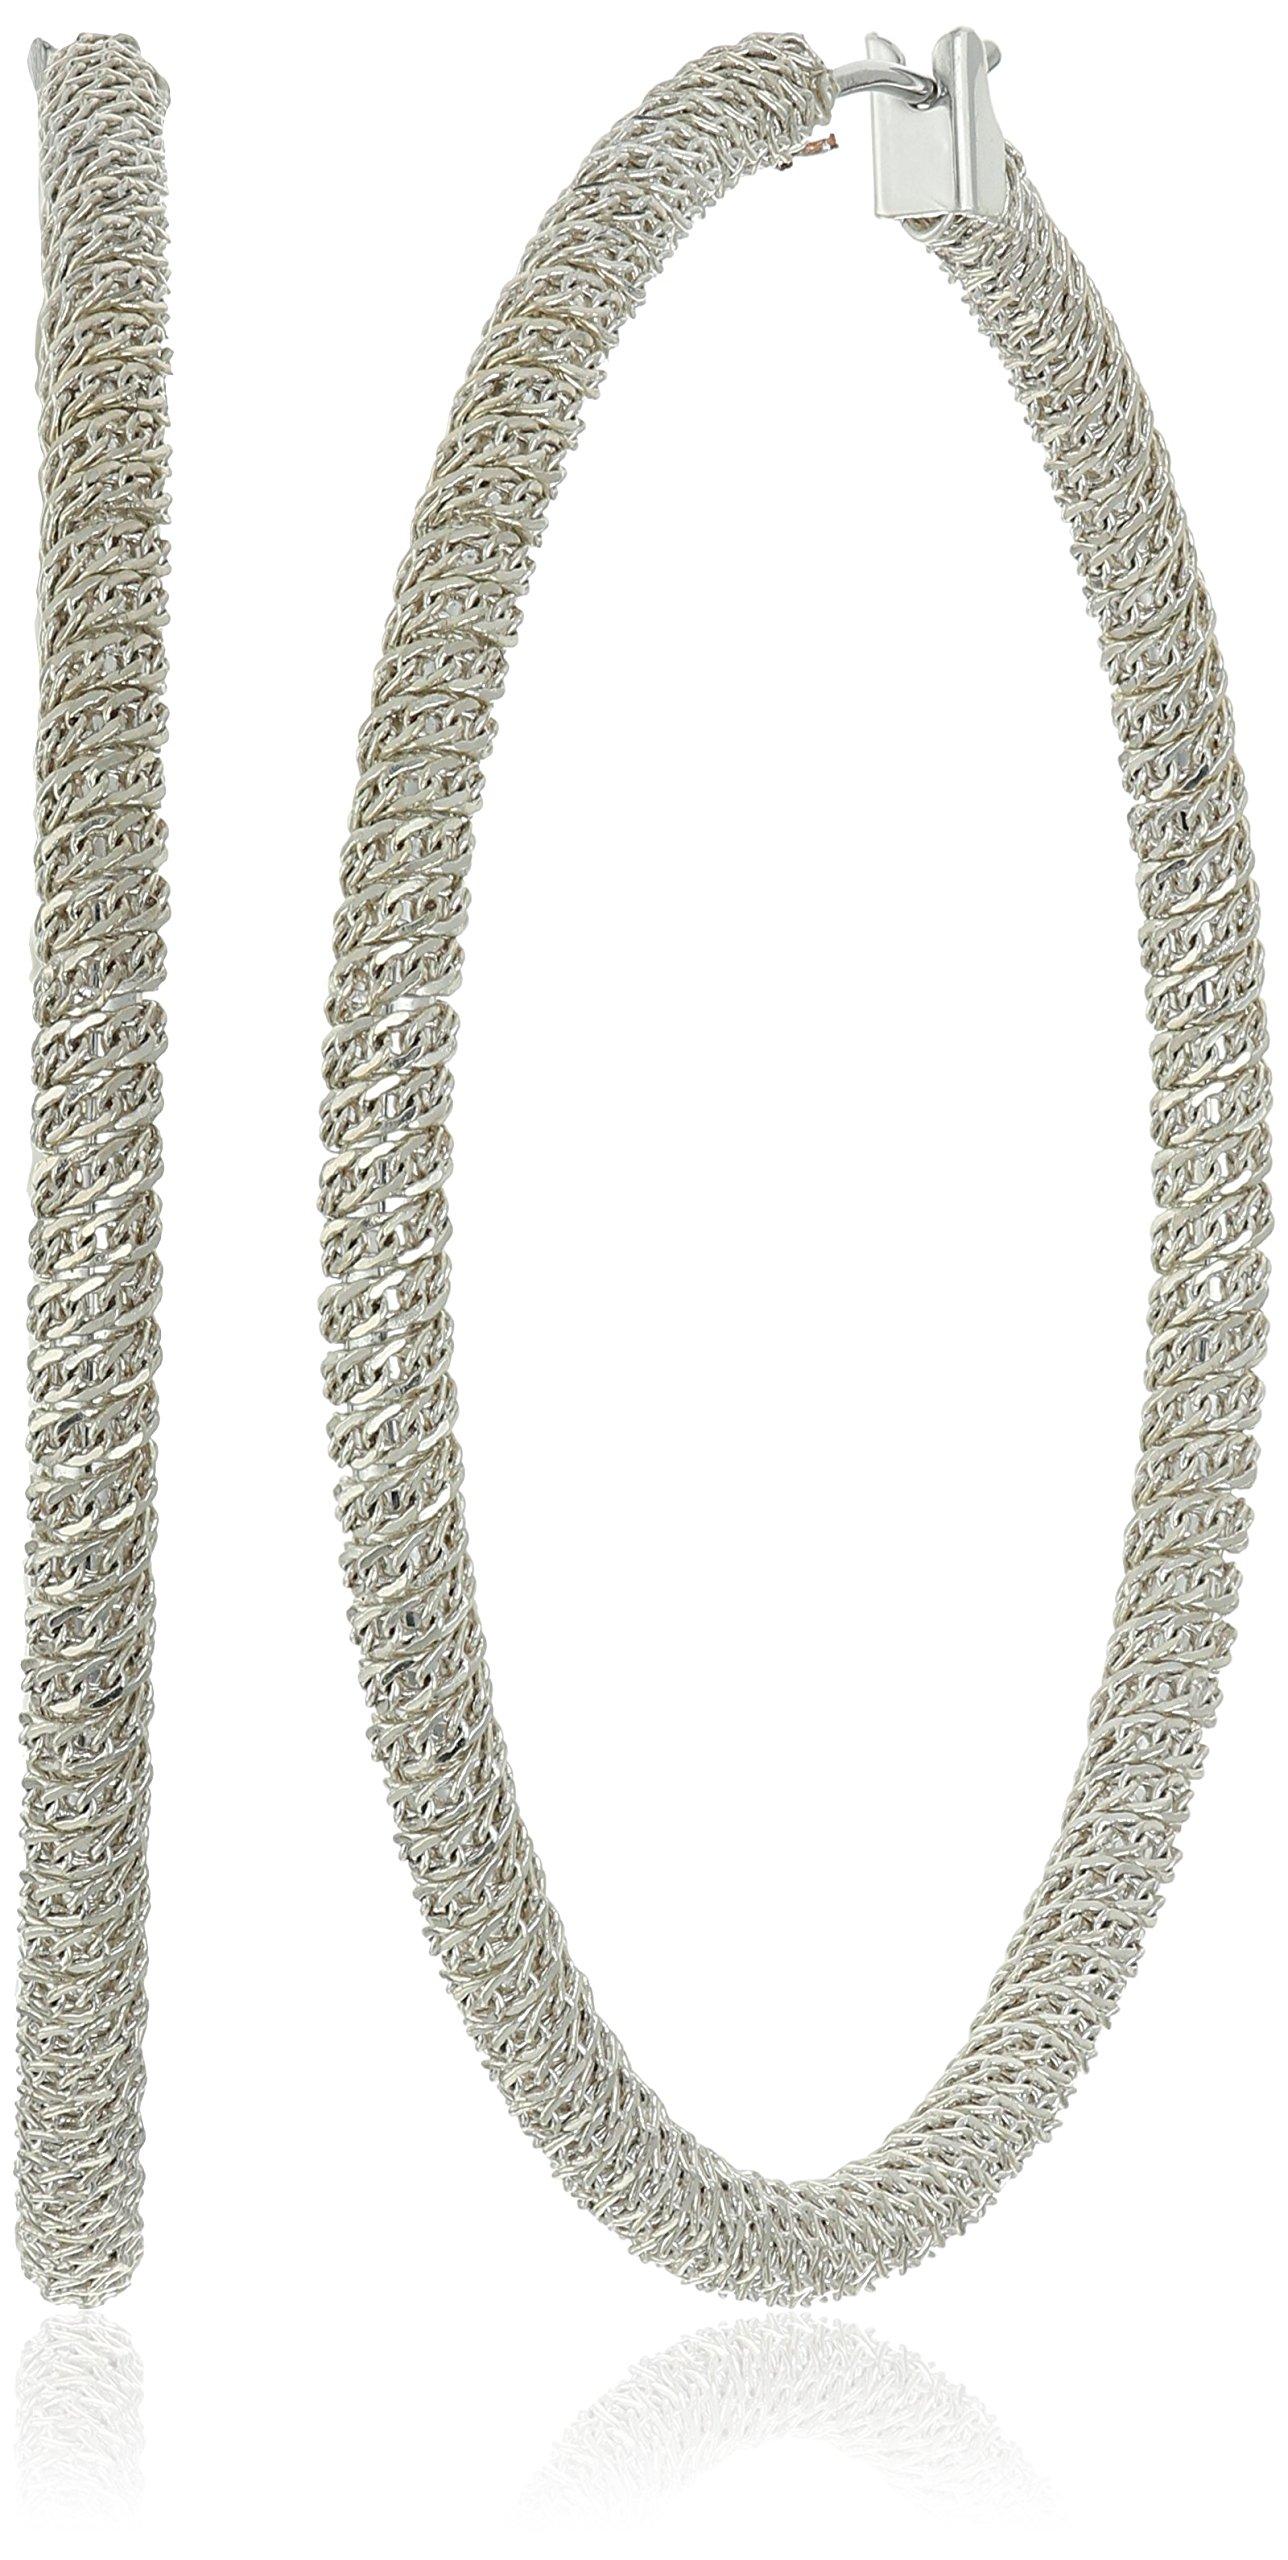 Diane von Furstenberg Thea Silver Chain Wrapped Hoop Earrings